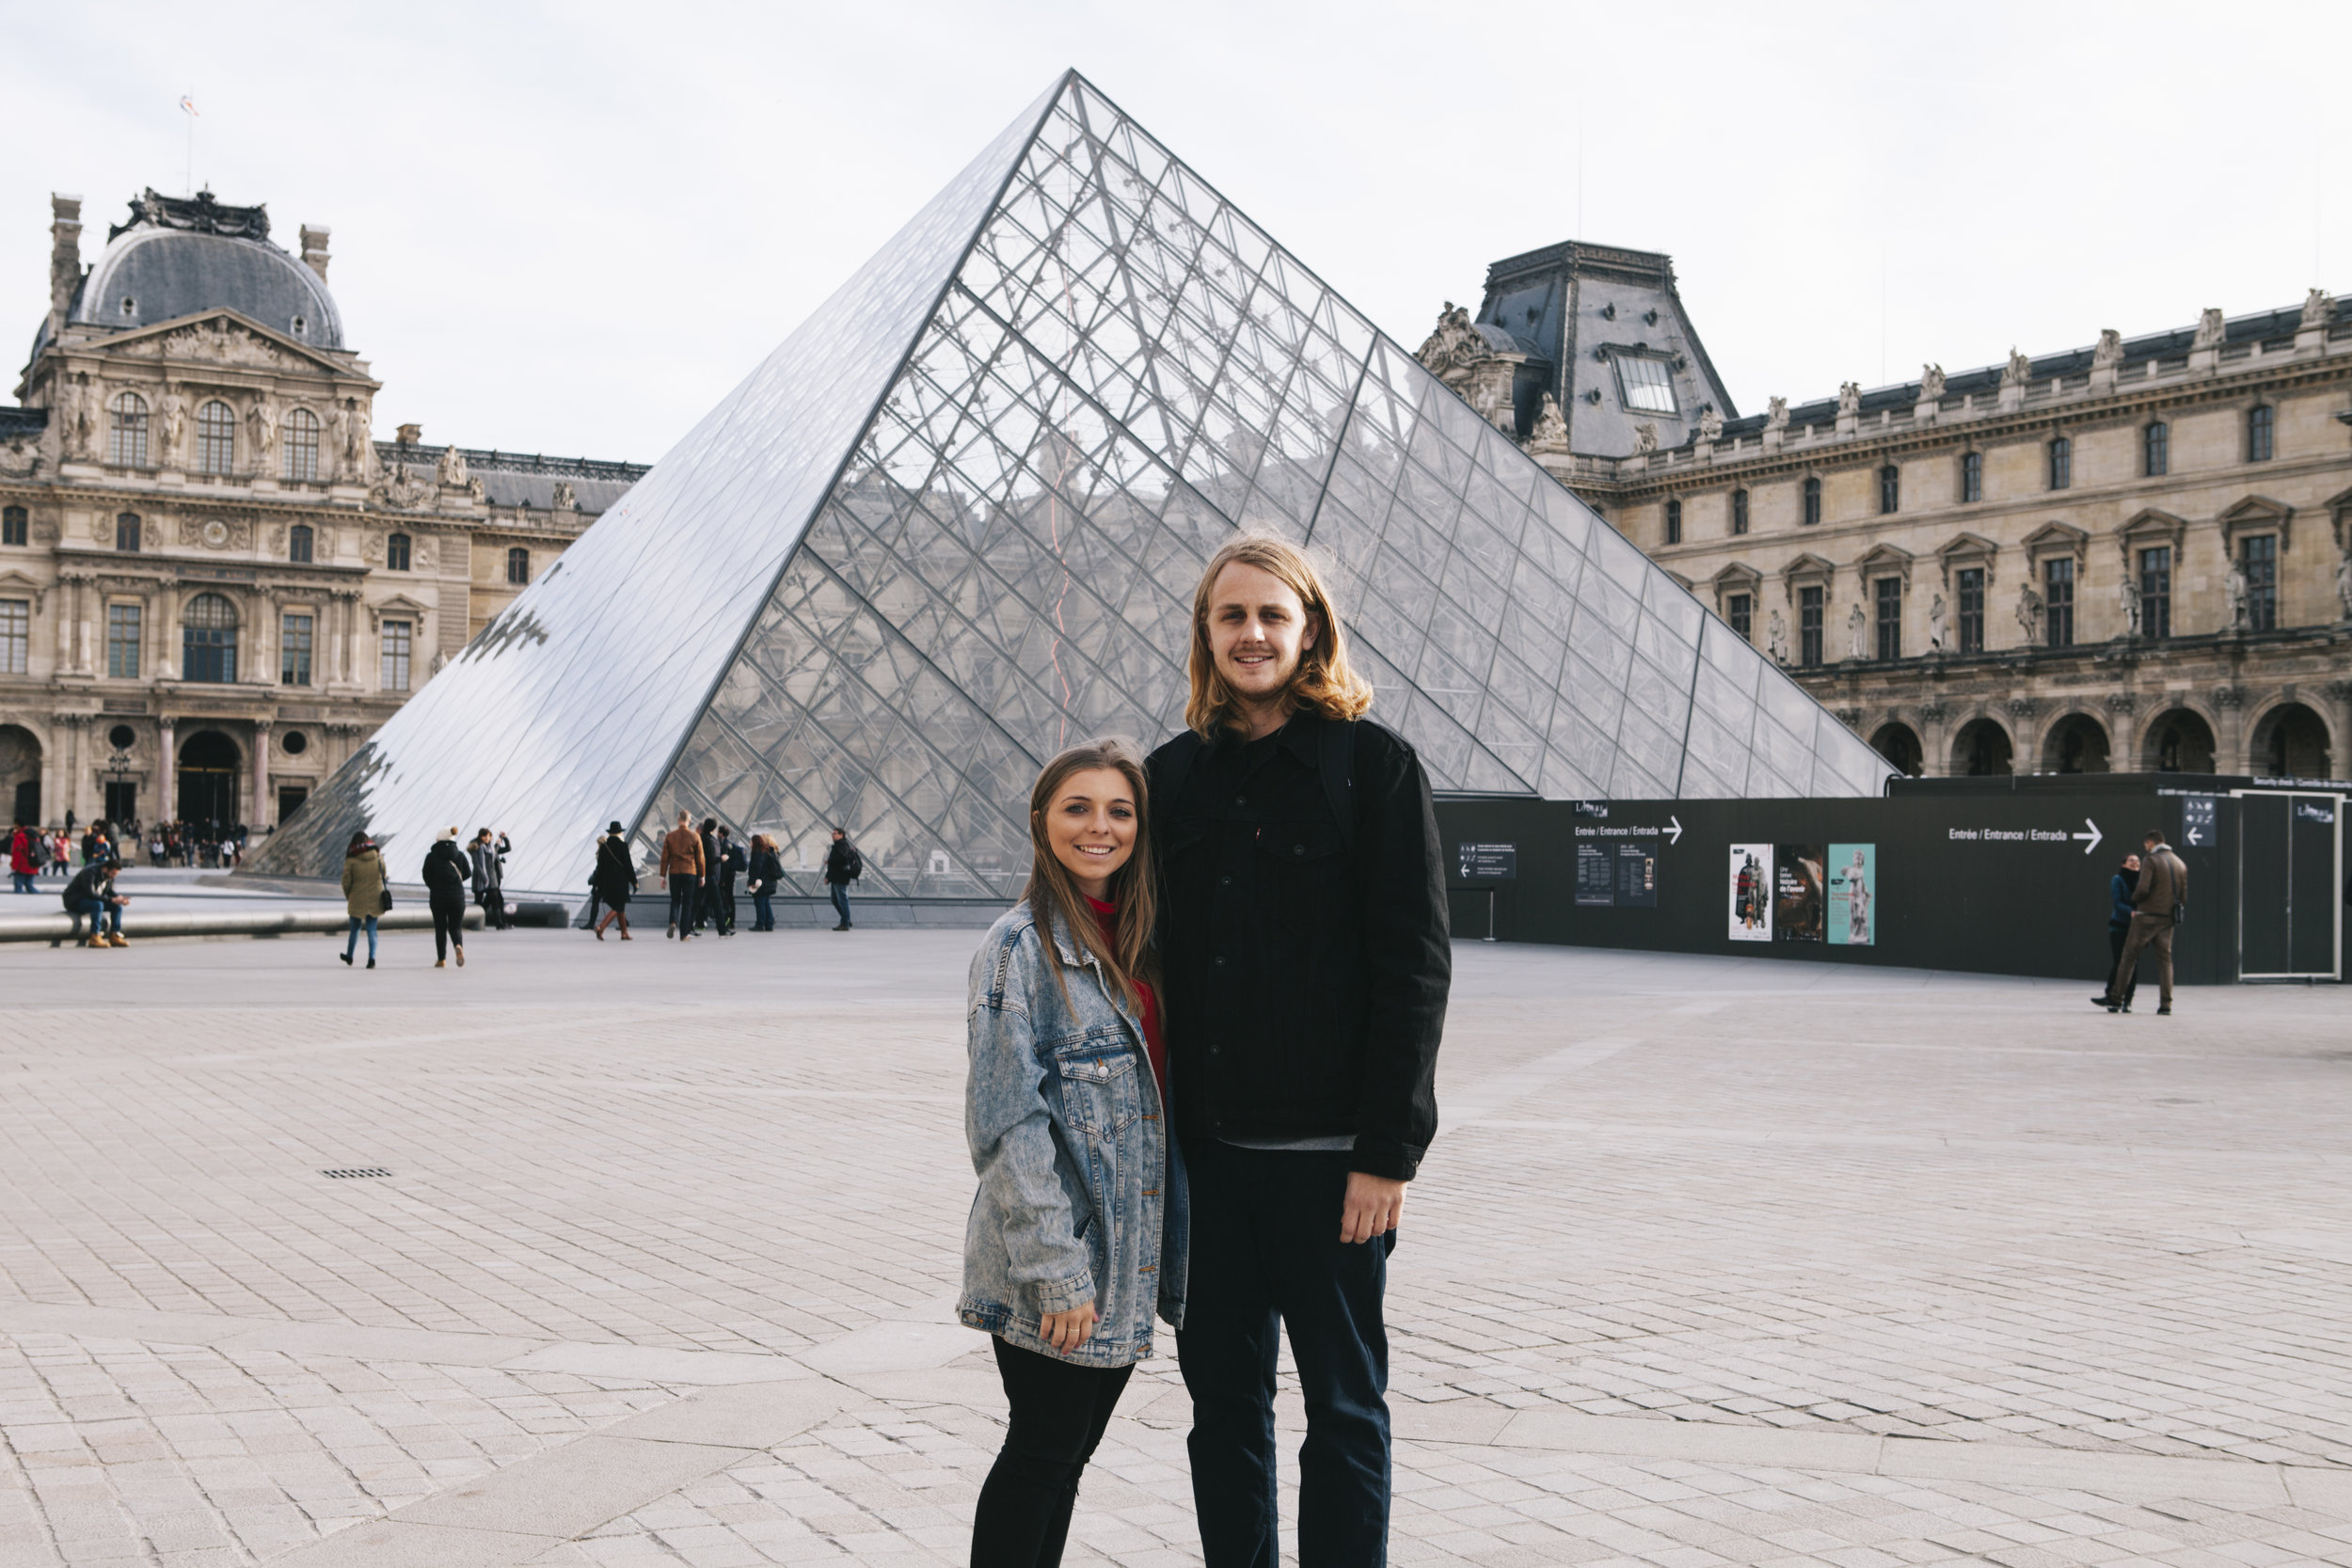 Louvre_8153.jpg